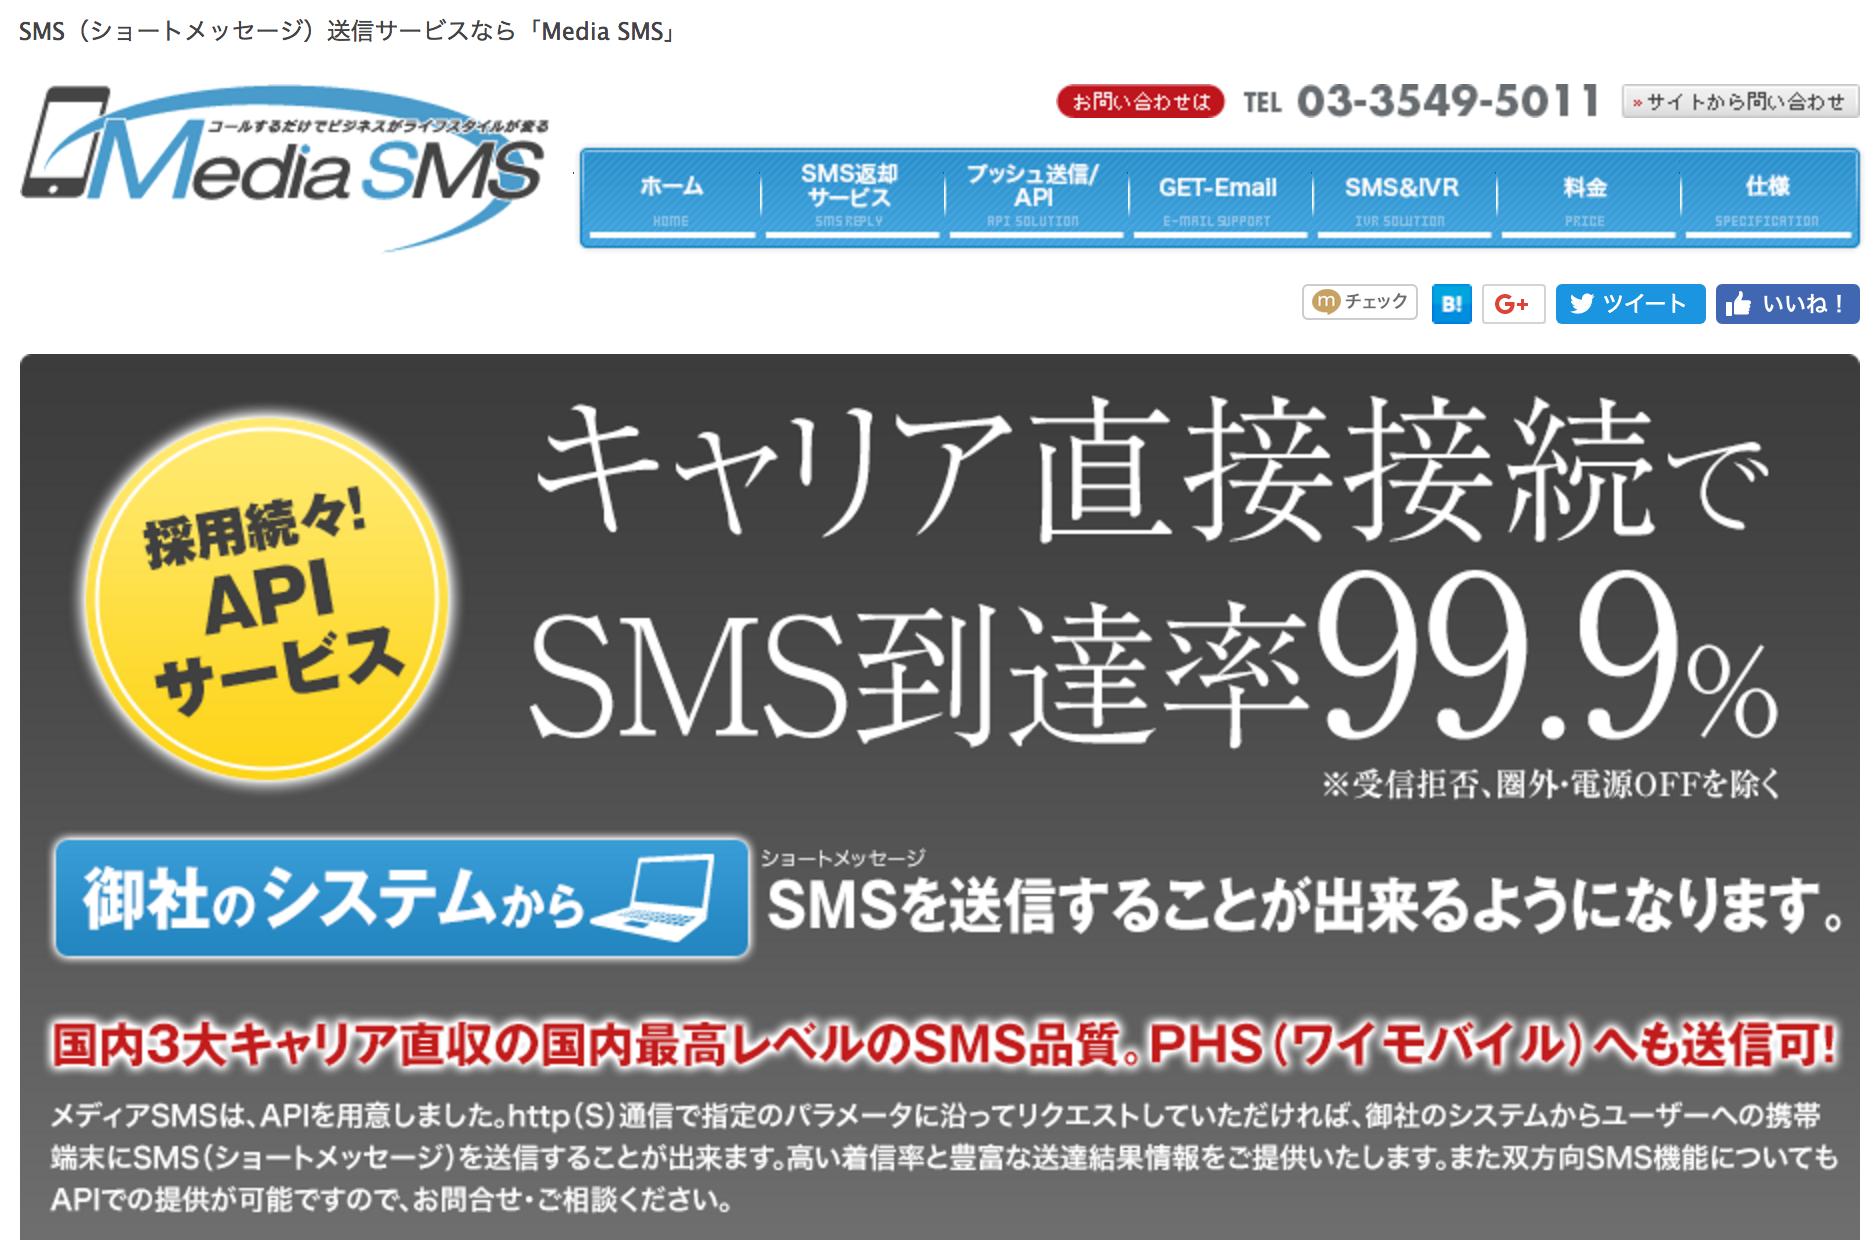 SMS の配信 事業者 比較 一覧 メディア4u-MediaSMS